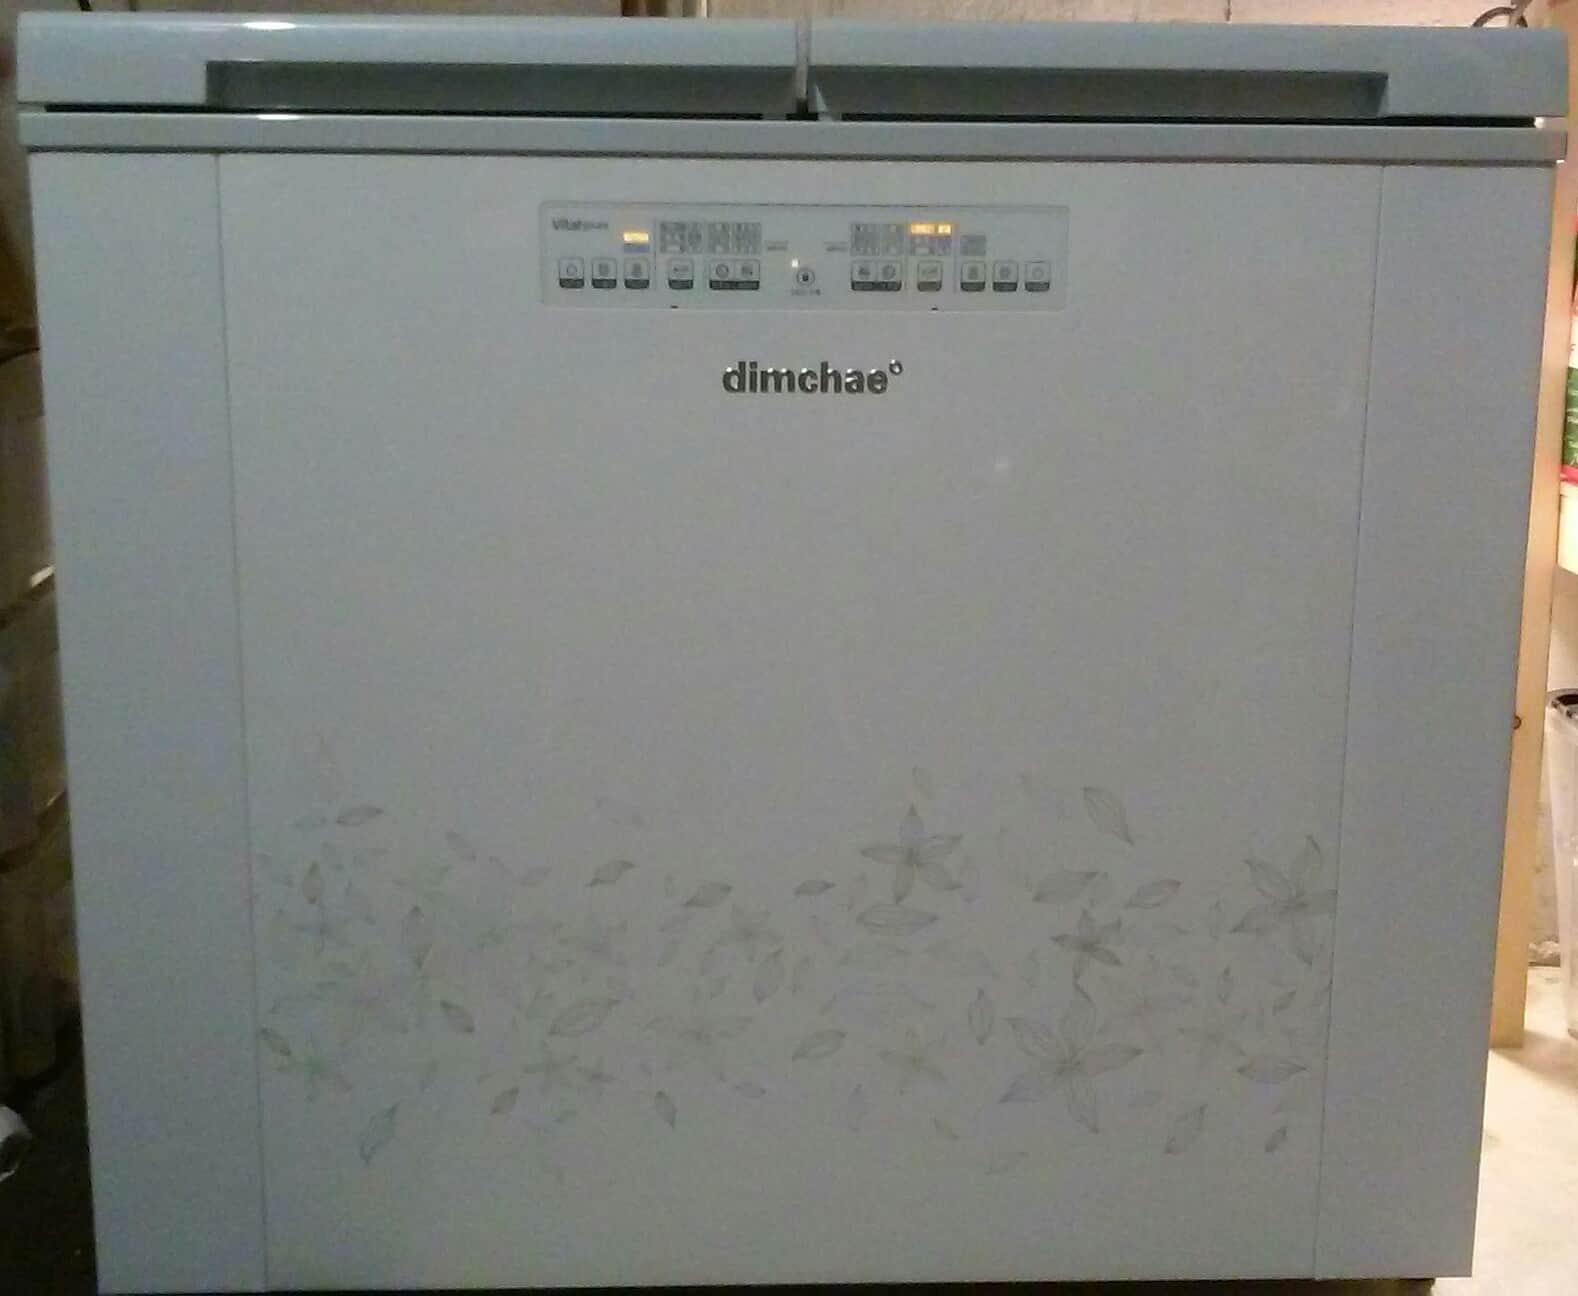 Stear siver samsung kimchi refrigerator manual – home design ideas.